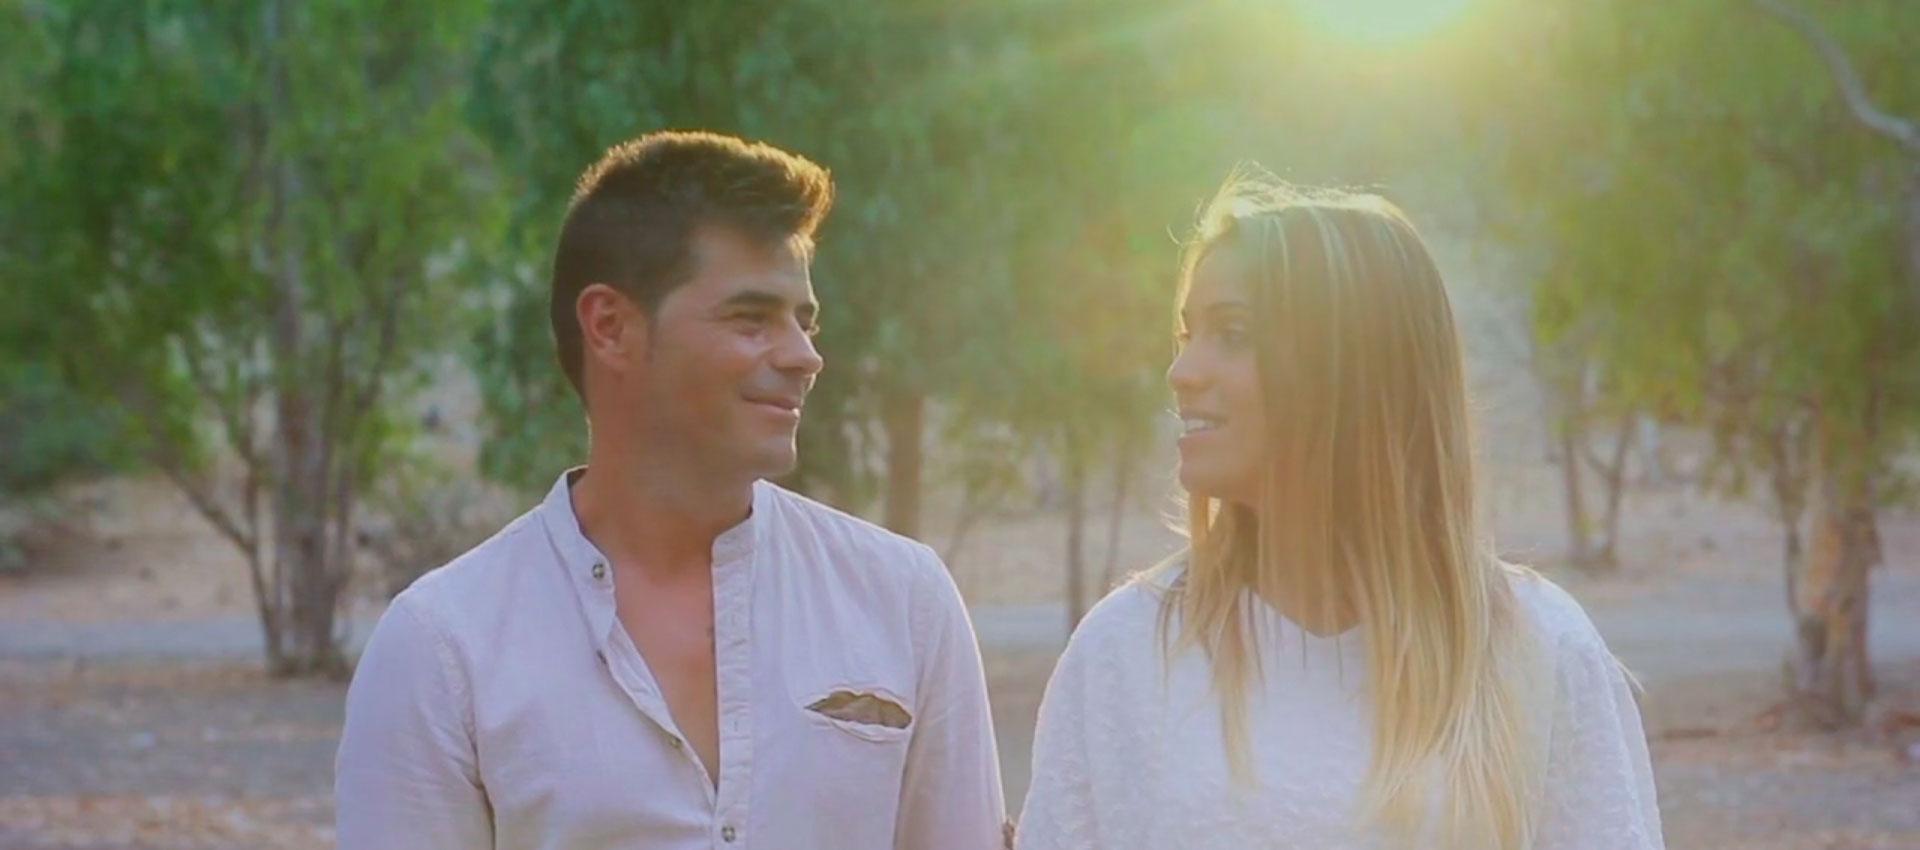 ongi Vídeo de boda - video boda cadiz